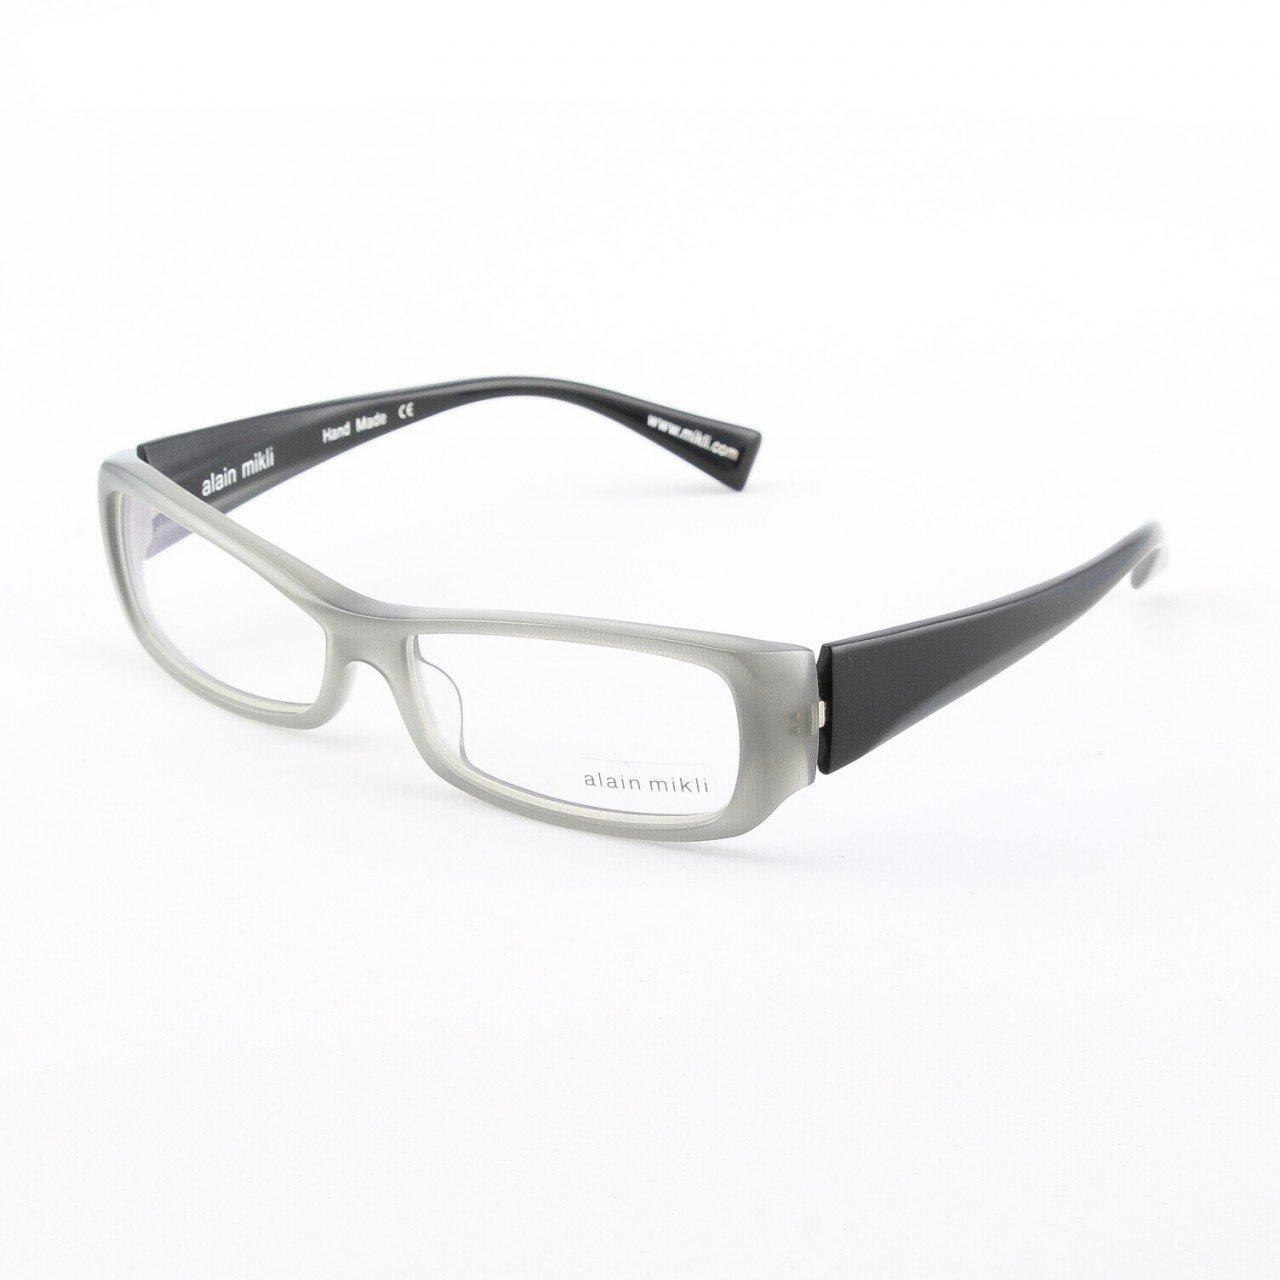 Alain Mikli Eyeglasses AL0793 Col. 12 Light Gray Translucent Frame with High Gloss Black Temples